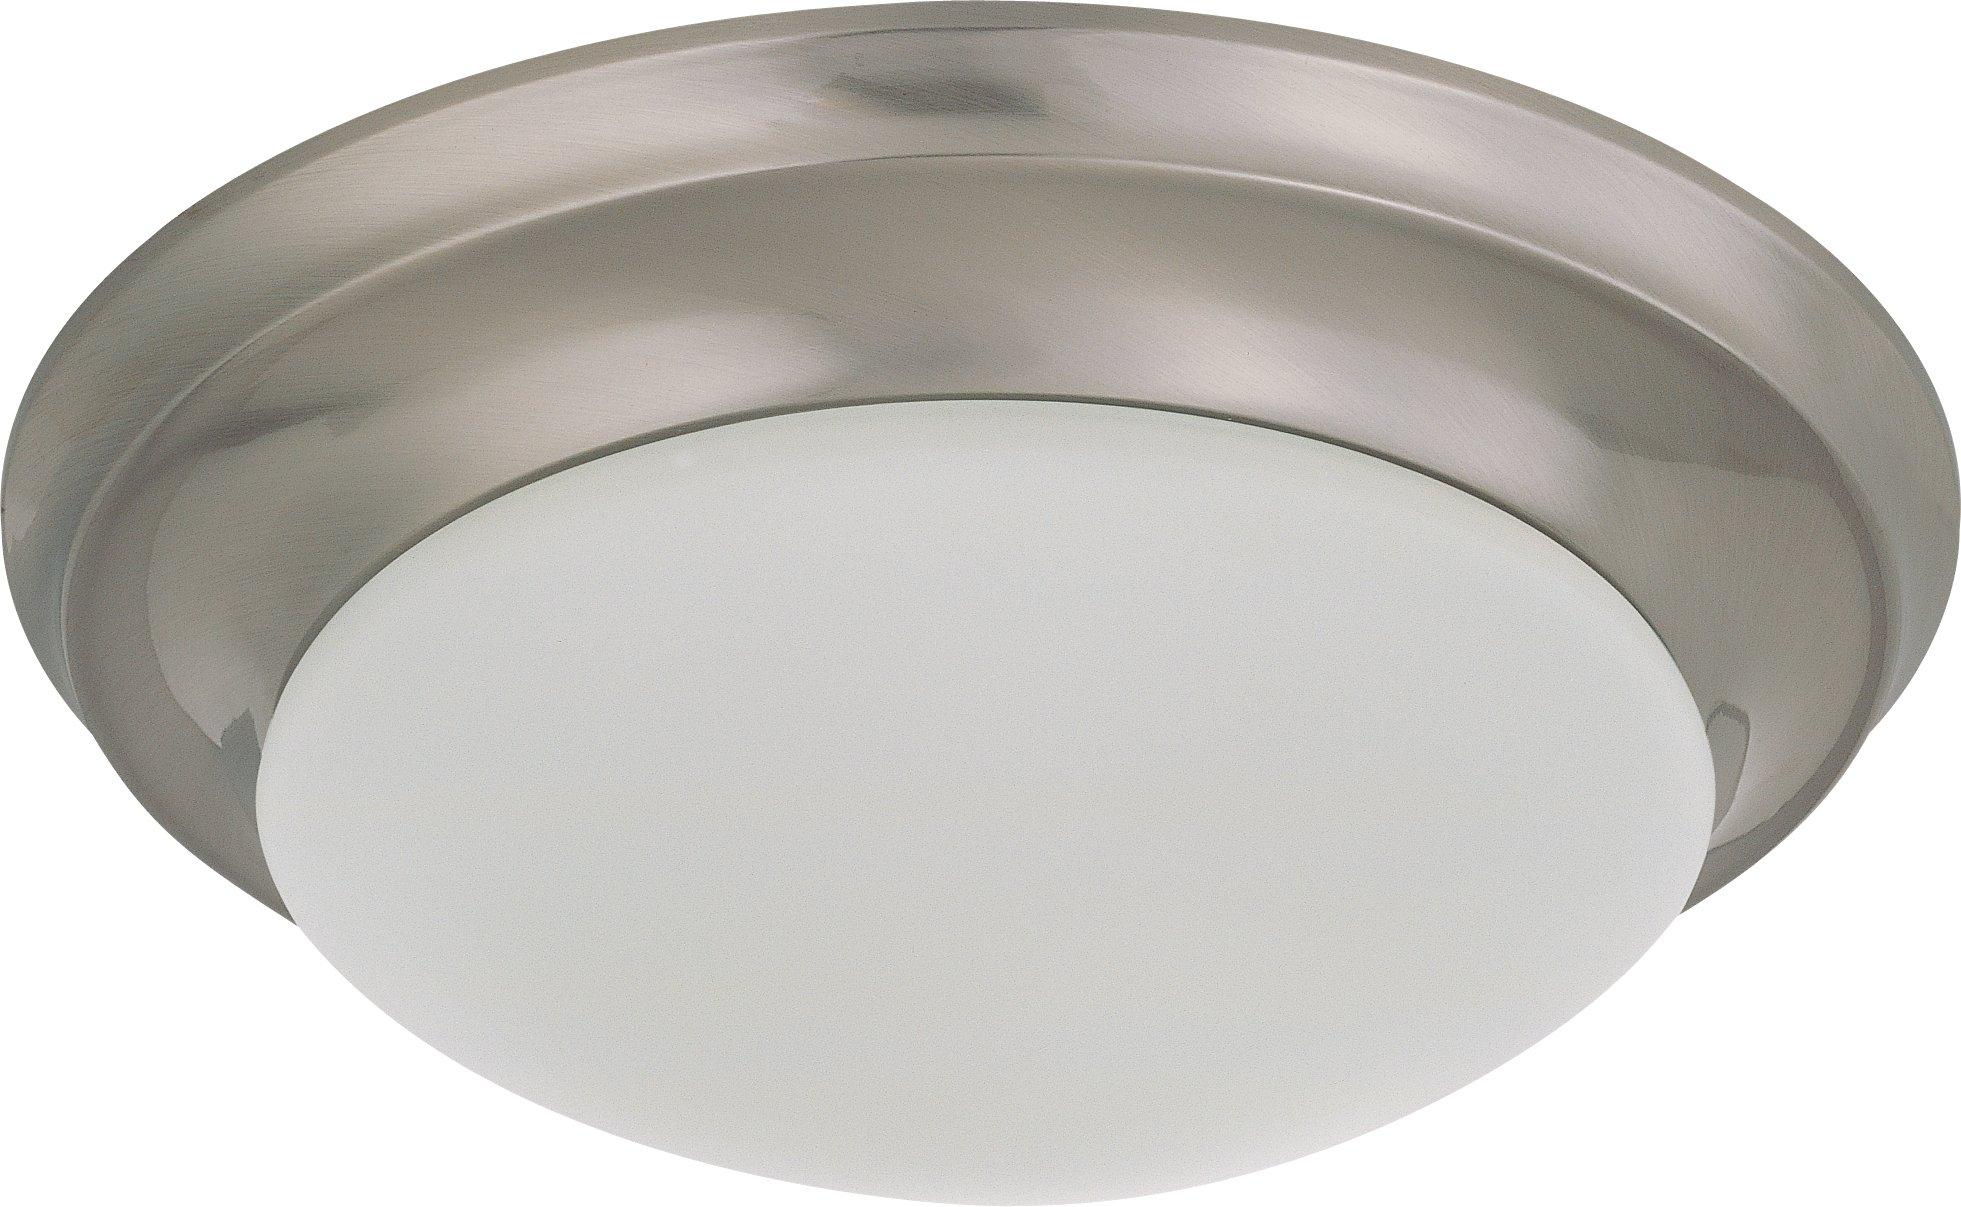 Nuvo Lighting 62/786 LED Twist & Lock Fixture Nuvo Flush Mount, 12 inch Diameter, Brushed Nickel